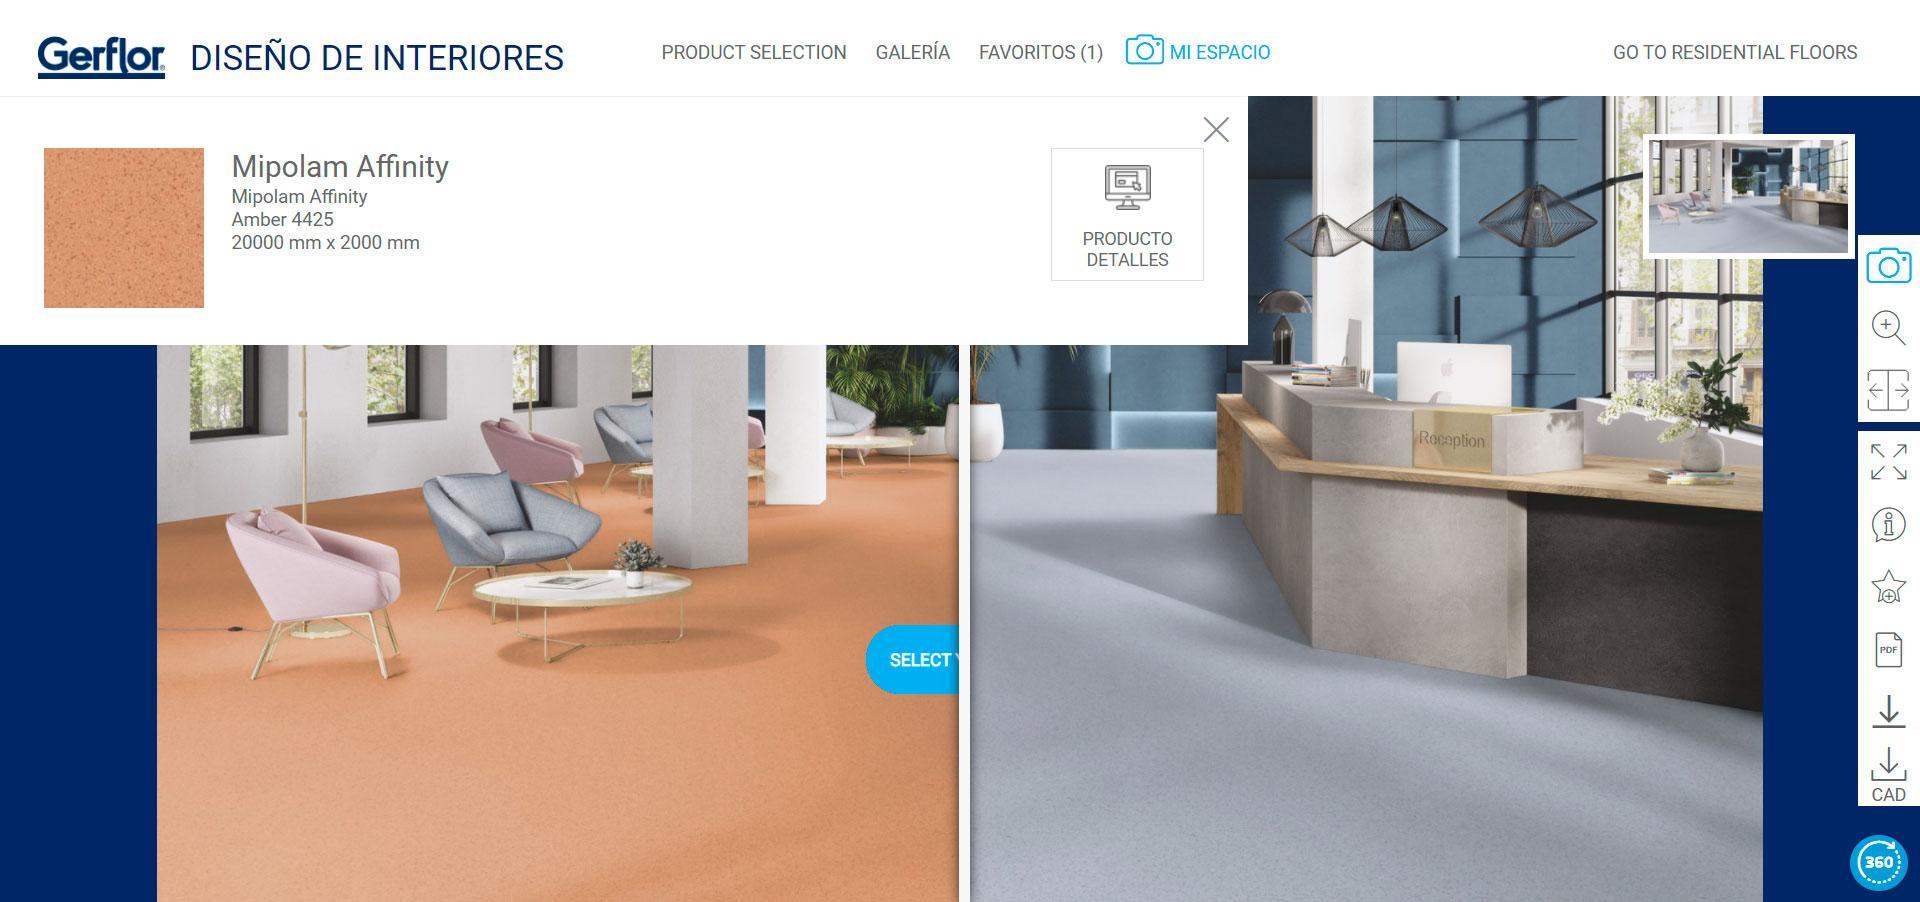 gerflor-interior-designer1